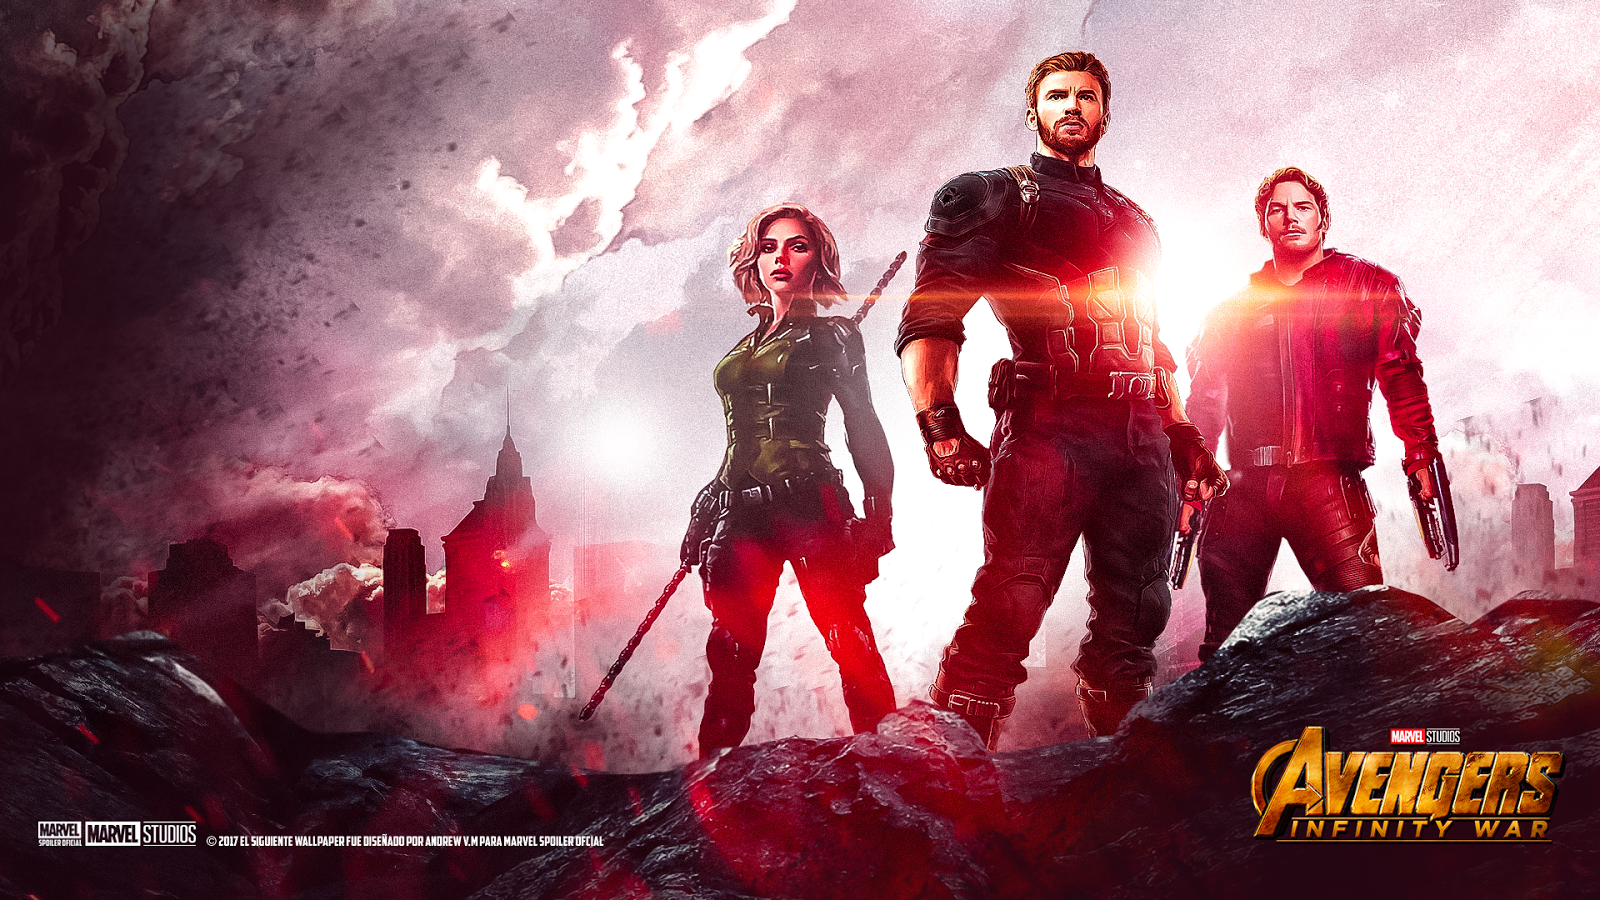 Avengers Infinity War Wallpapers - Avengers Infinity War Wallpaper HD